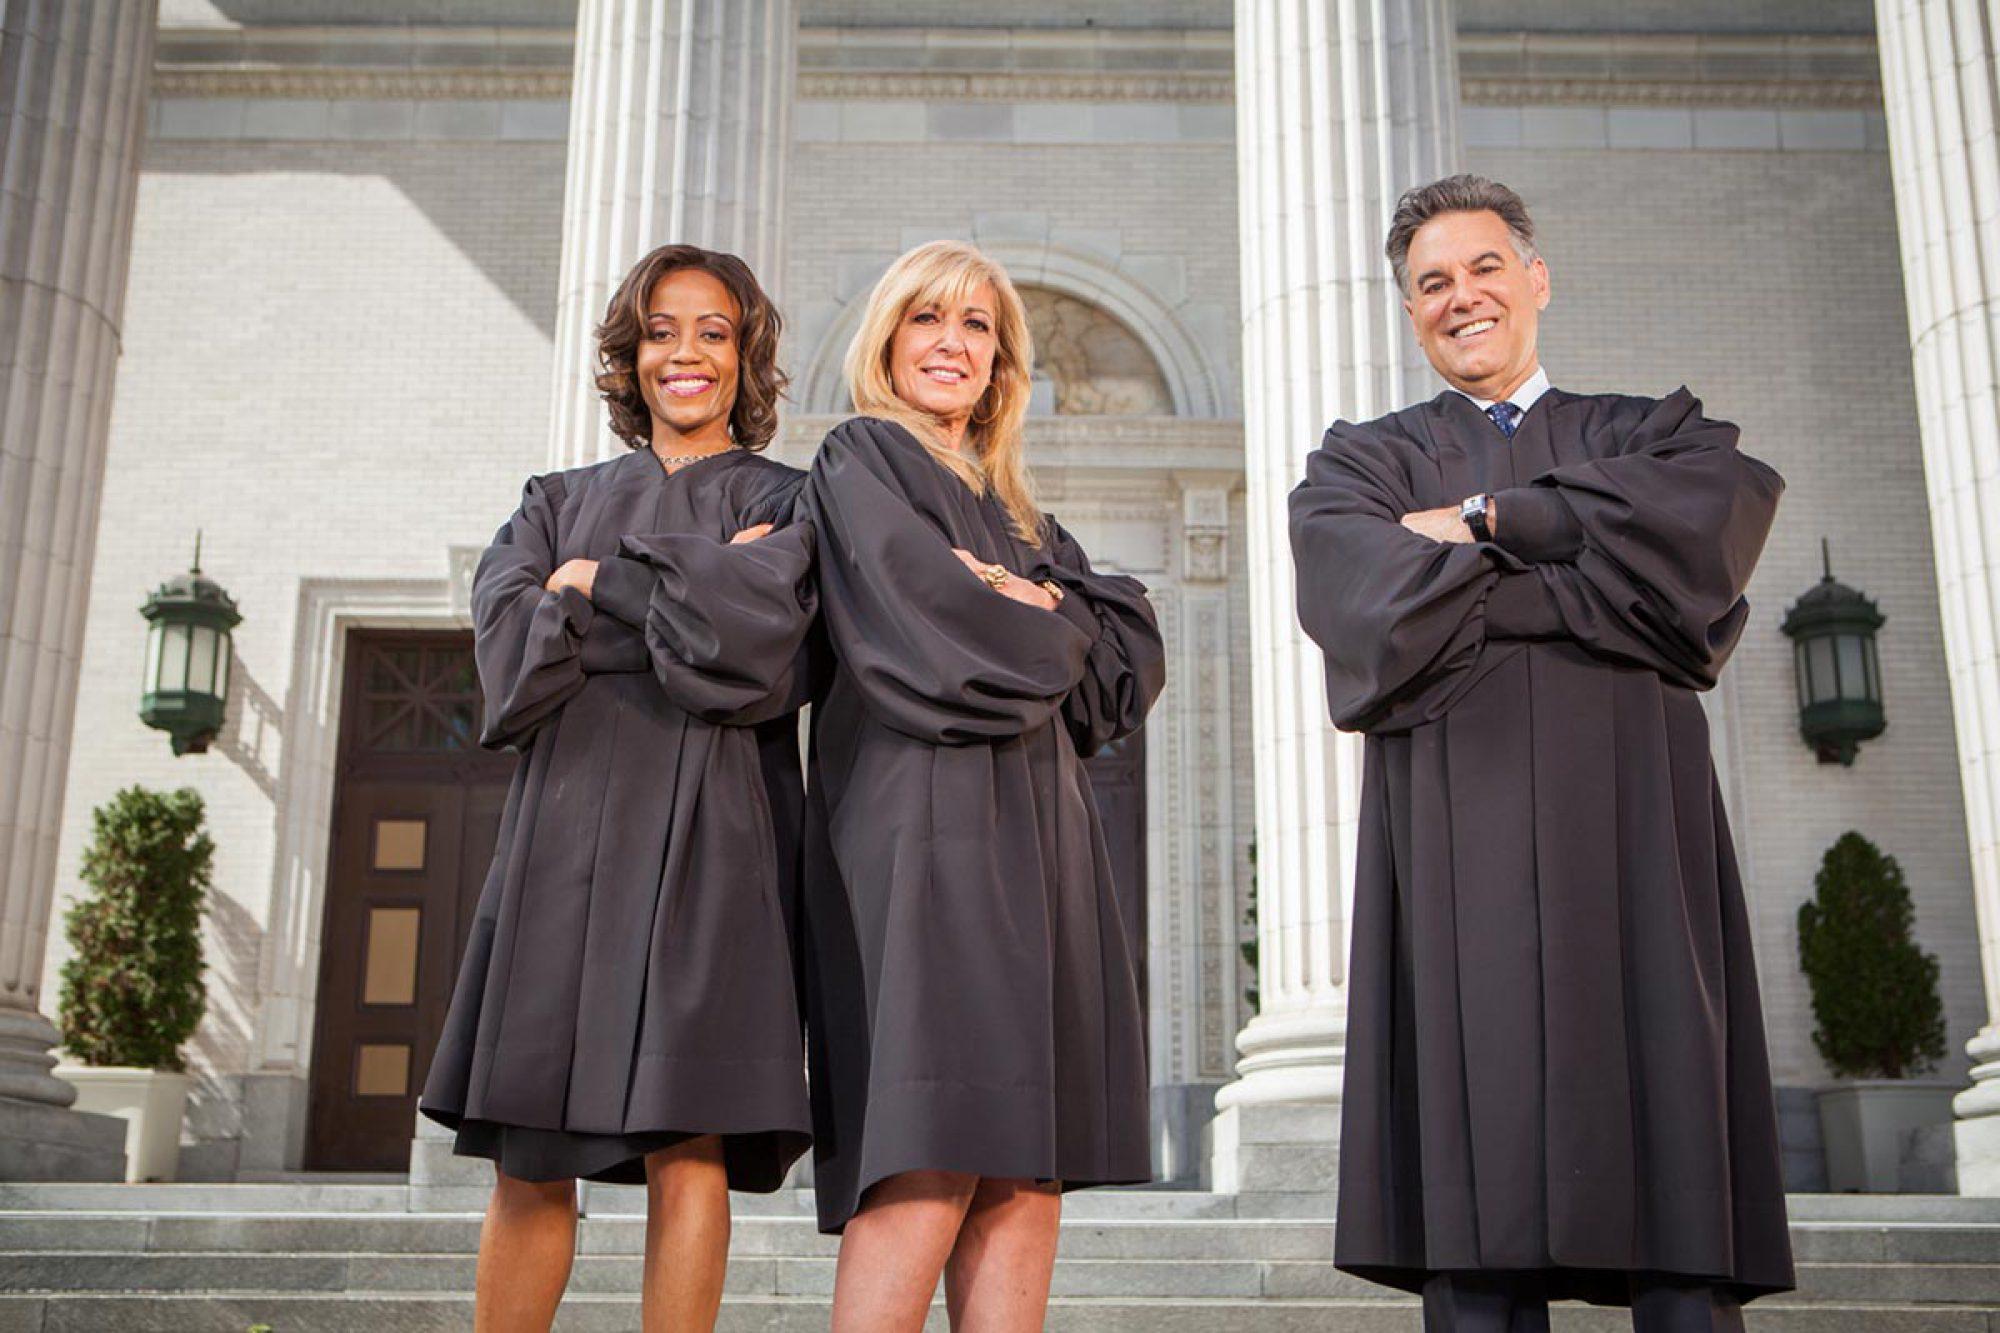 hot-bench-judges-